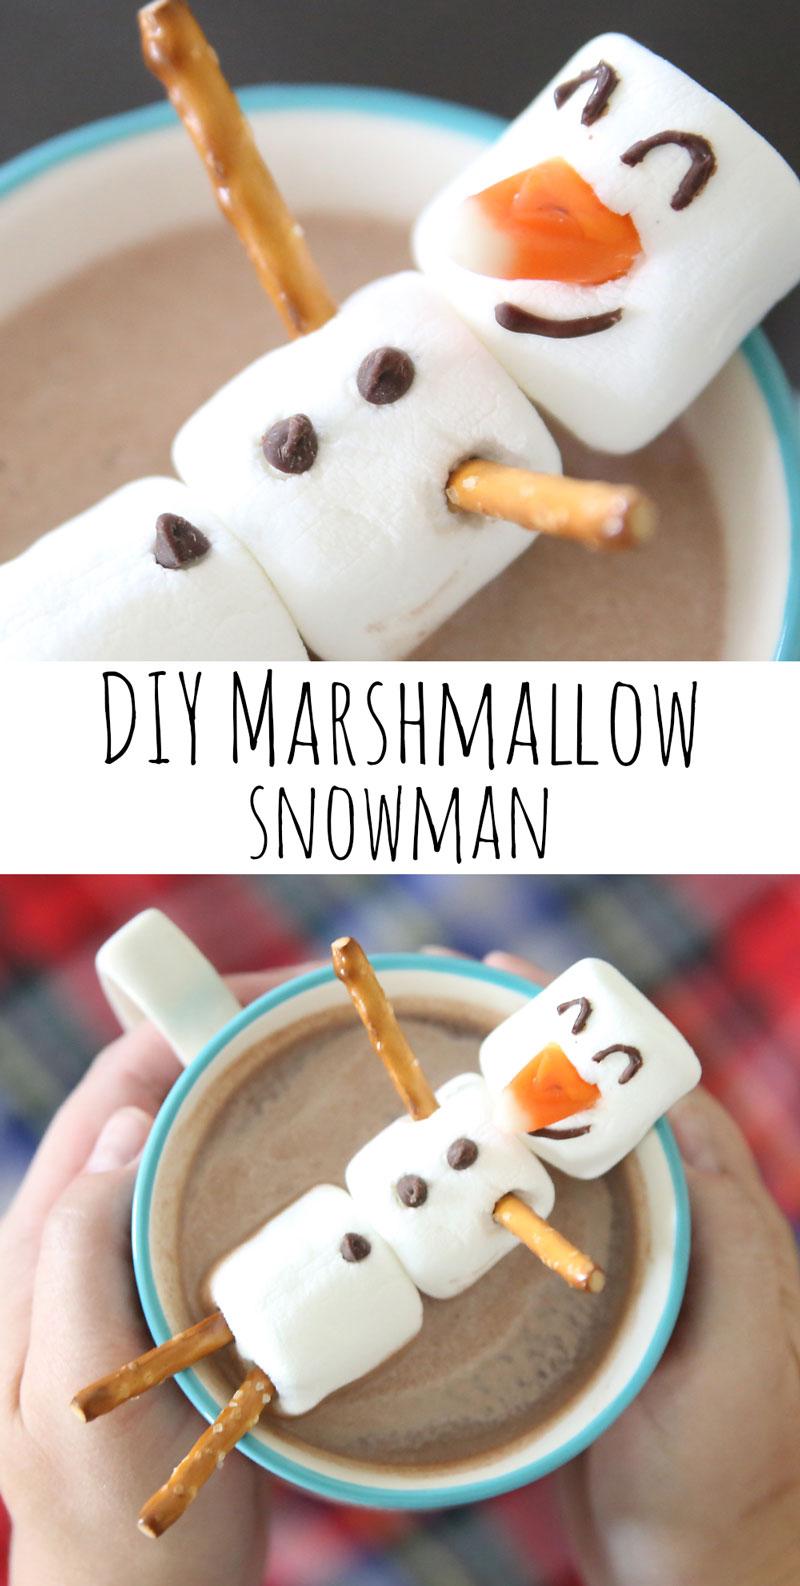 marshmallow-snowman-hot-chocolate-easy-kids-food-craft-activity-winter-fun-how-to-make-a-marshmallow-snowman-2.jpg